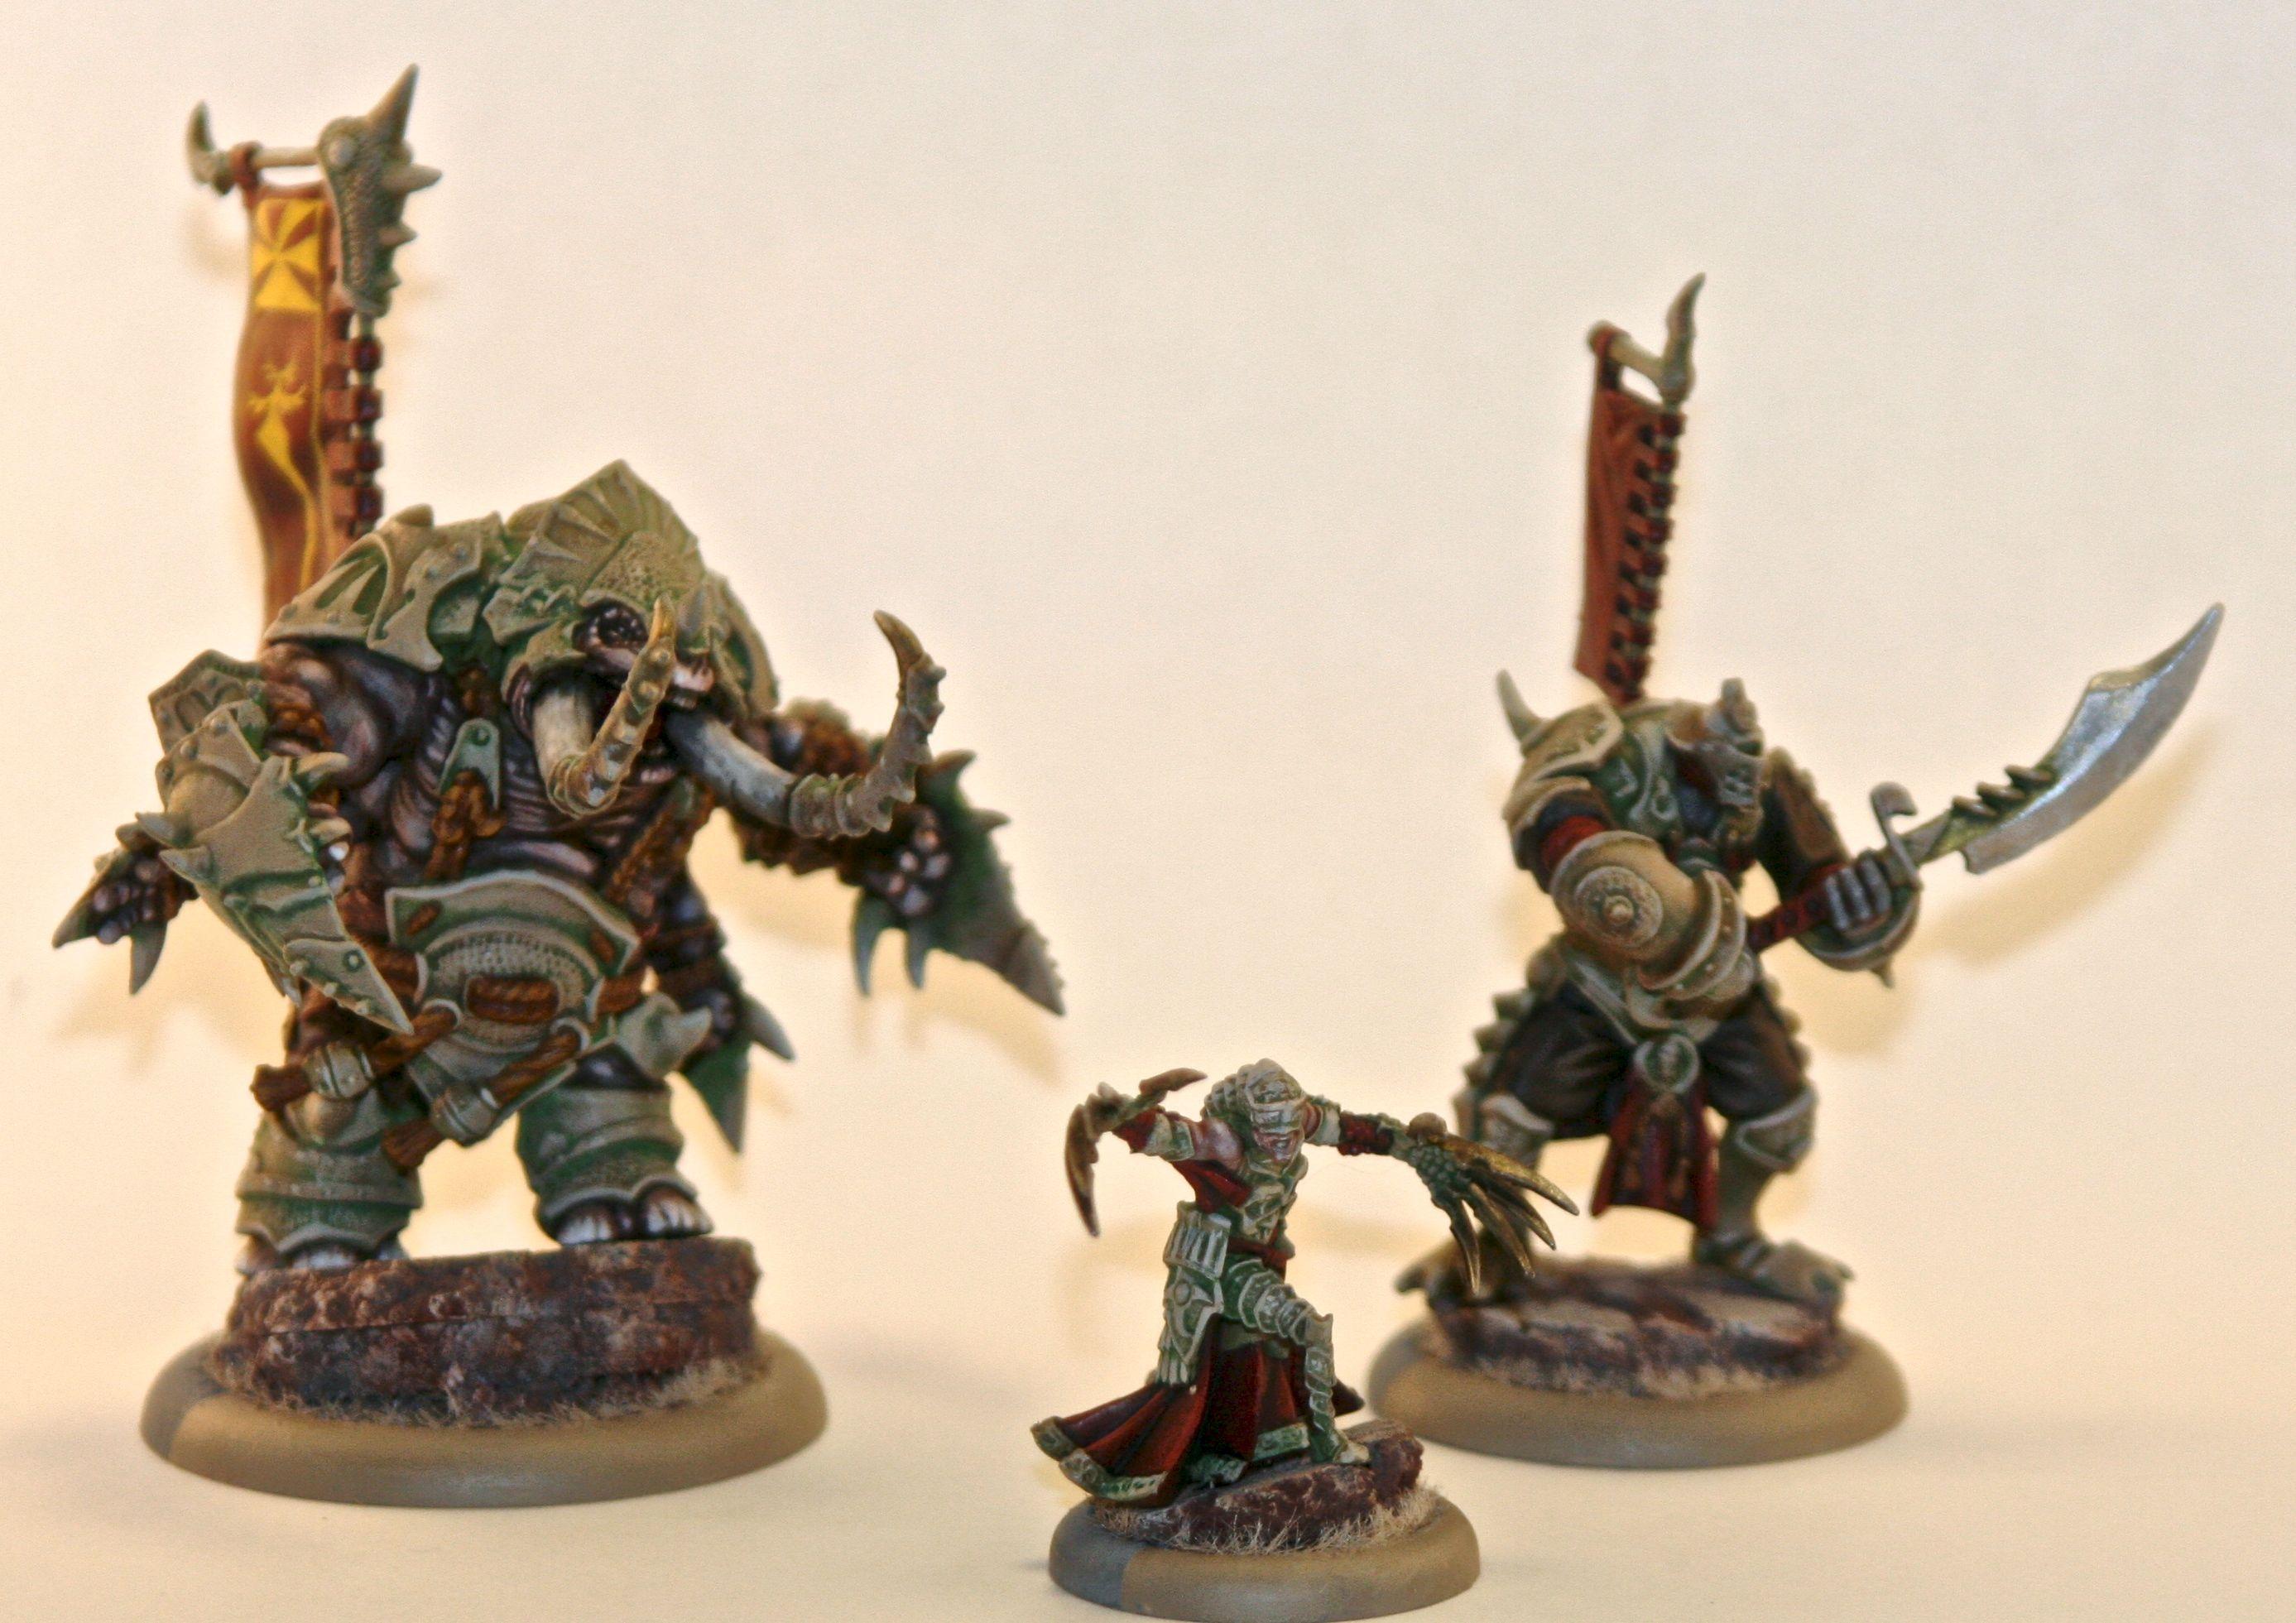 Battle Group, Cyclops, Gladiator, Morgoul, Pmorghoul, Savage, Skorne, Titan